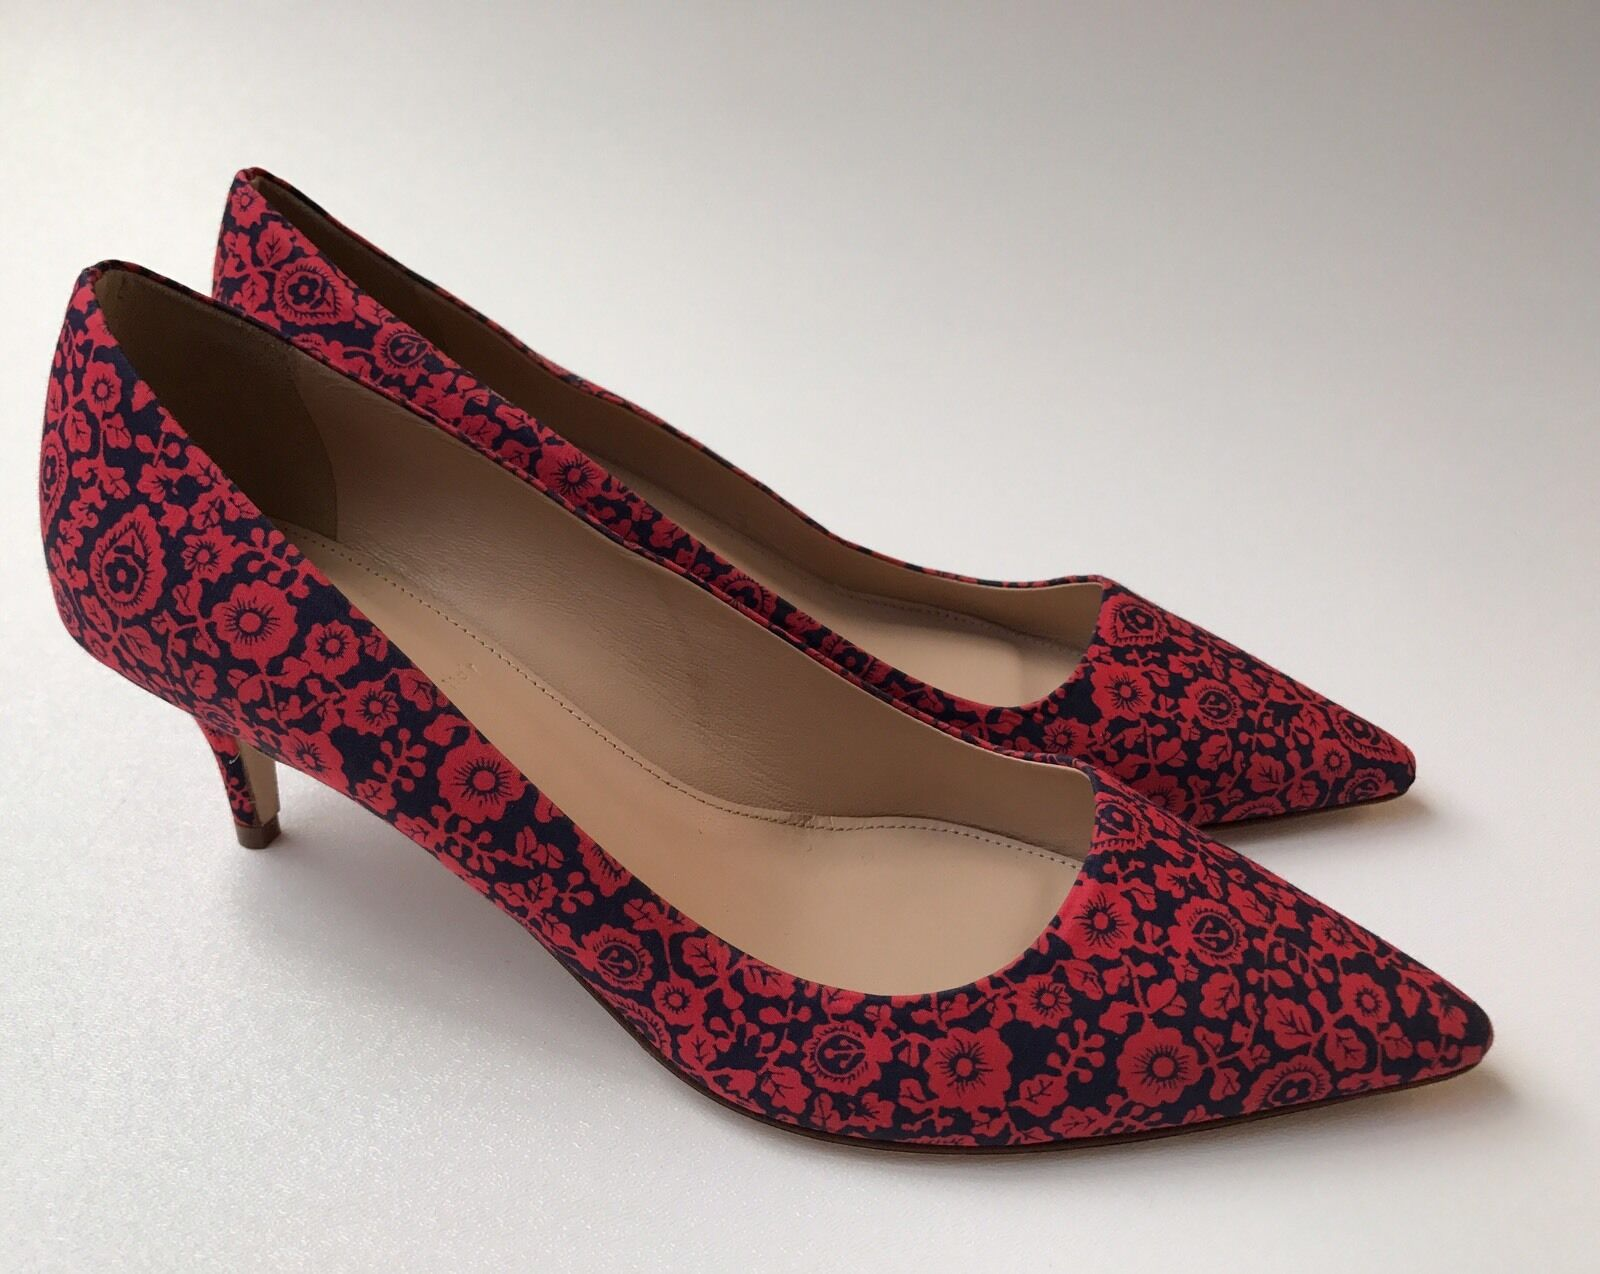 J.CREW Dulci Printed Heels Sz 7 rot rot rot Fabric b0376  228 529d6d